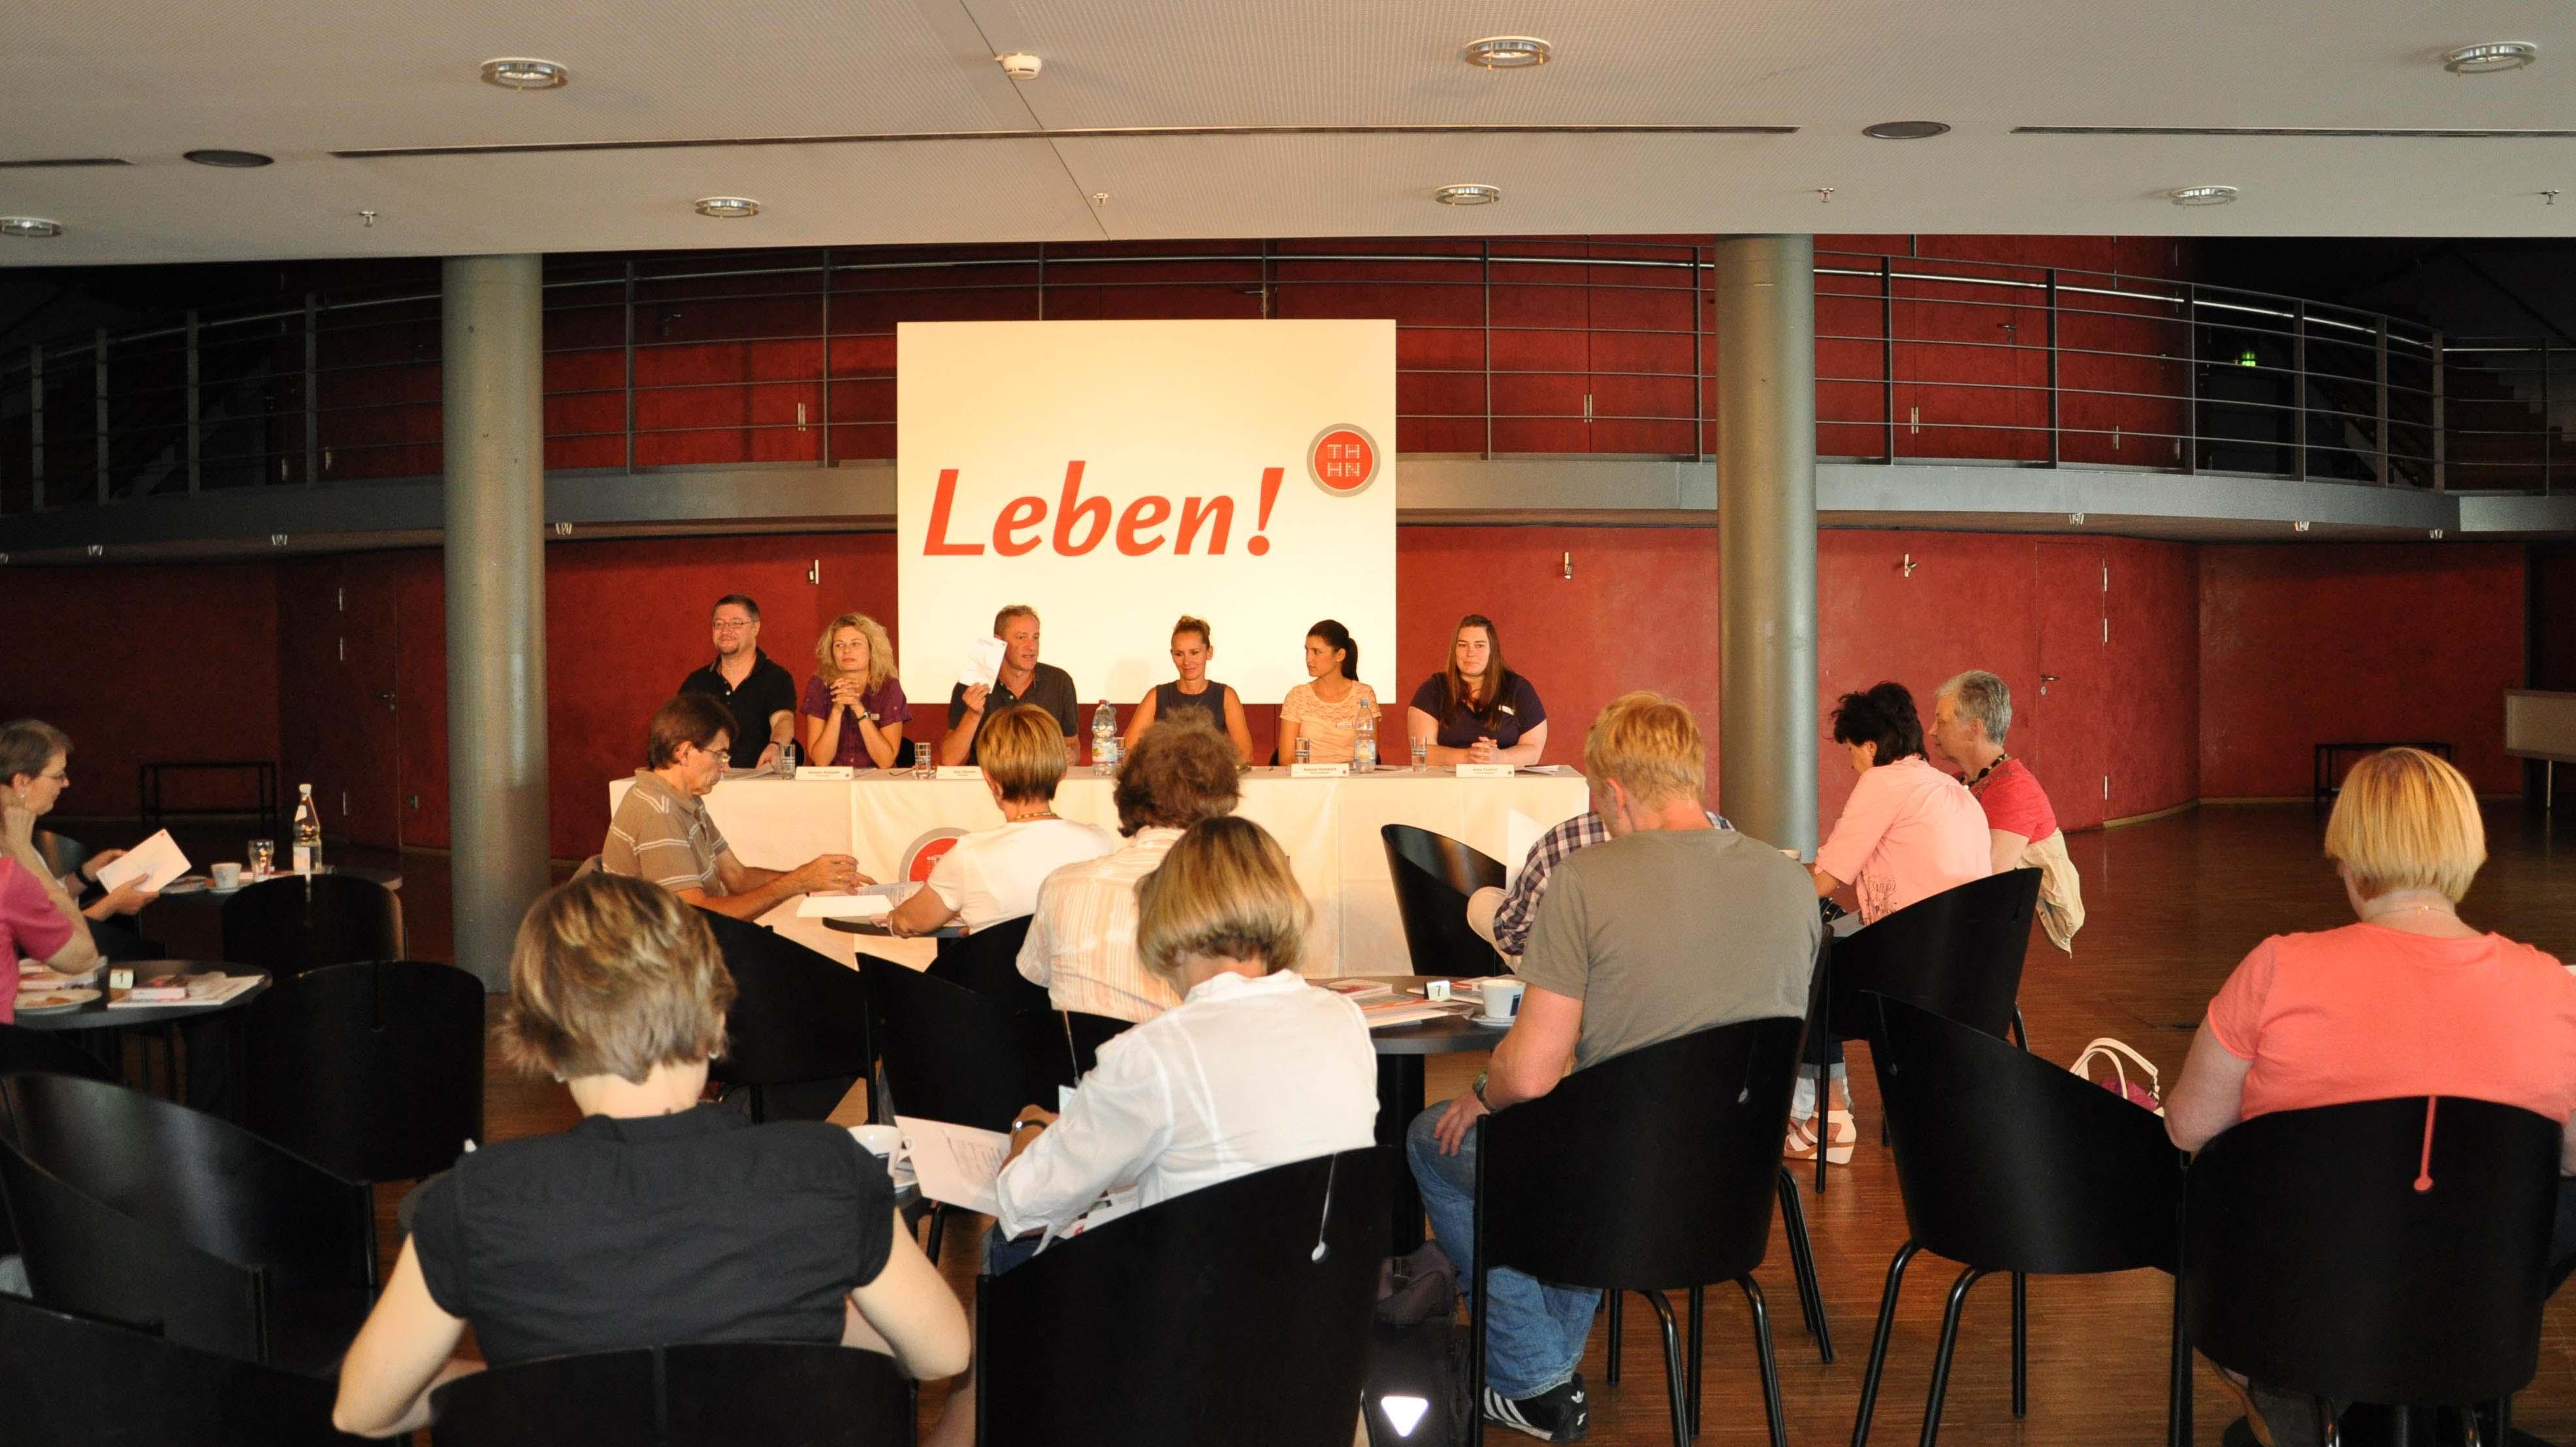 Andreas Frane, Stefanie Symmank, Axel Vornam, Katrin Singer, Ramona Klumbach, Antjé Femfert (v.l.)